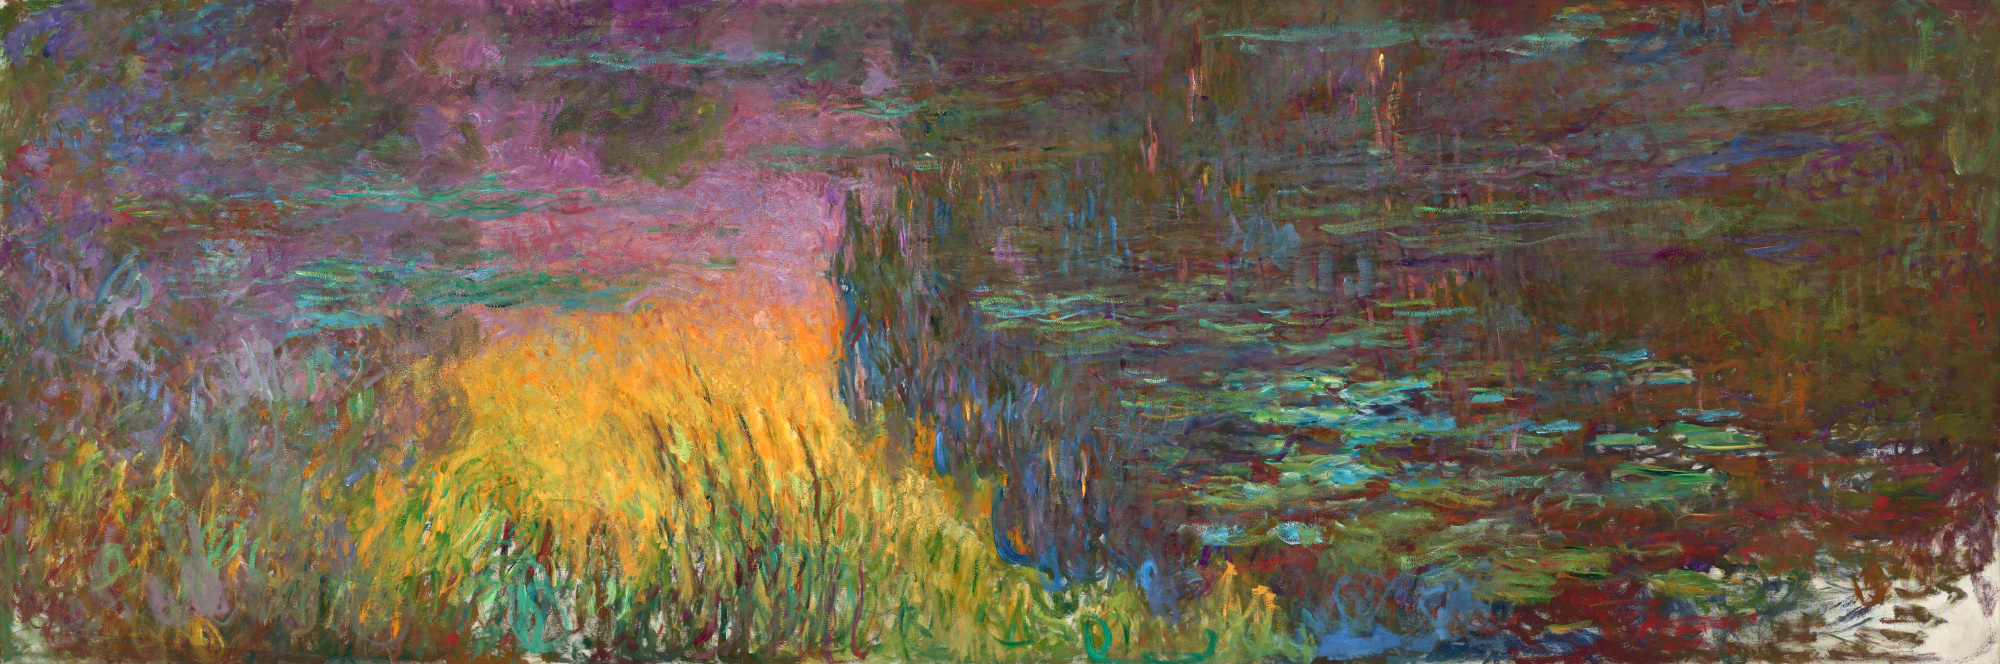 Water Lilies 1914 1926 Claude Monet Wikiart Org